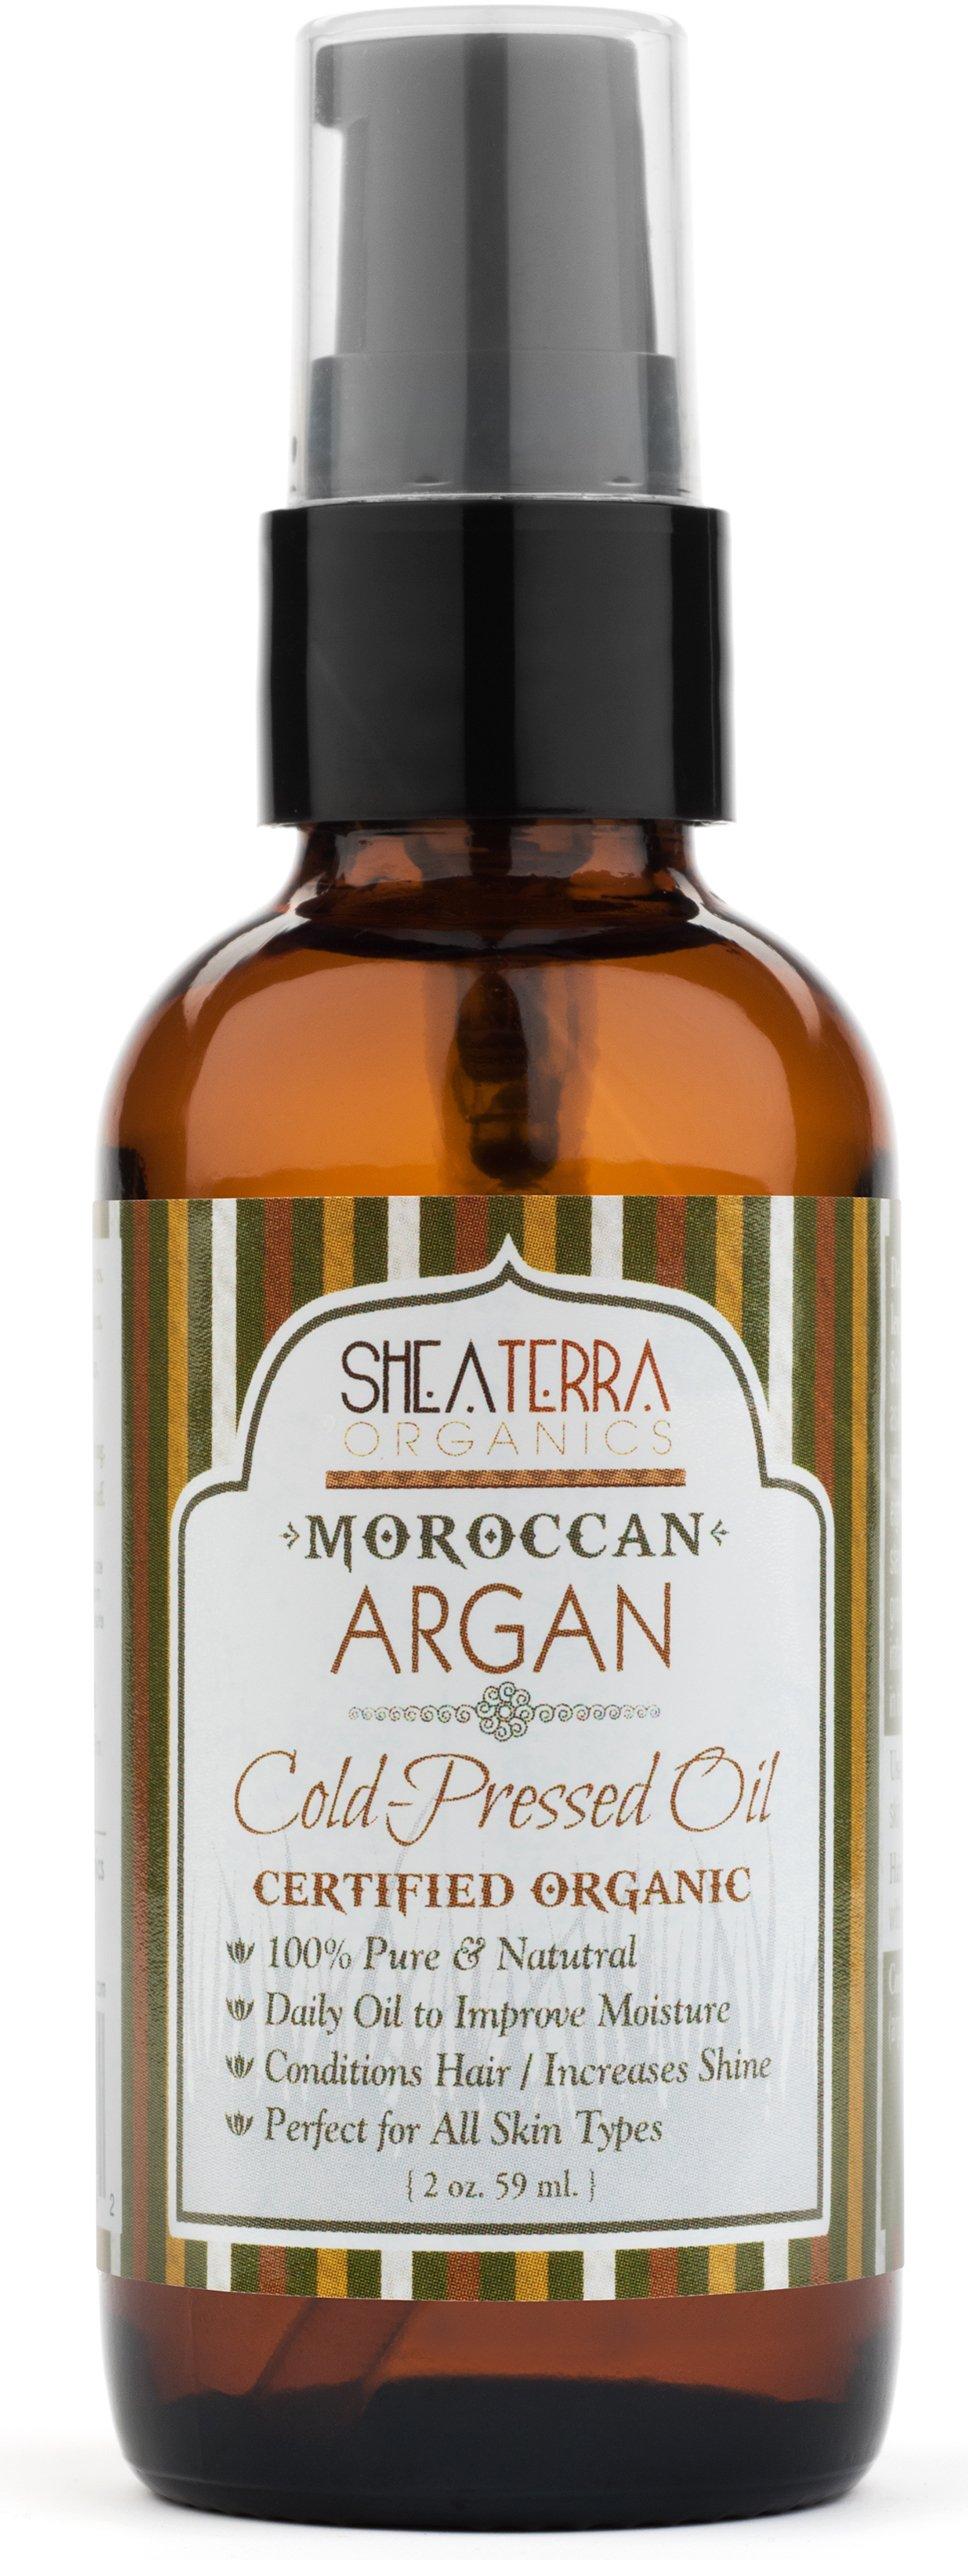 Shea Terra Organics - 100% Pure, Cold Pressed Moroccan Argan Oil, 2 oz